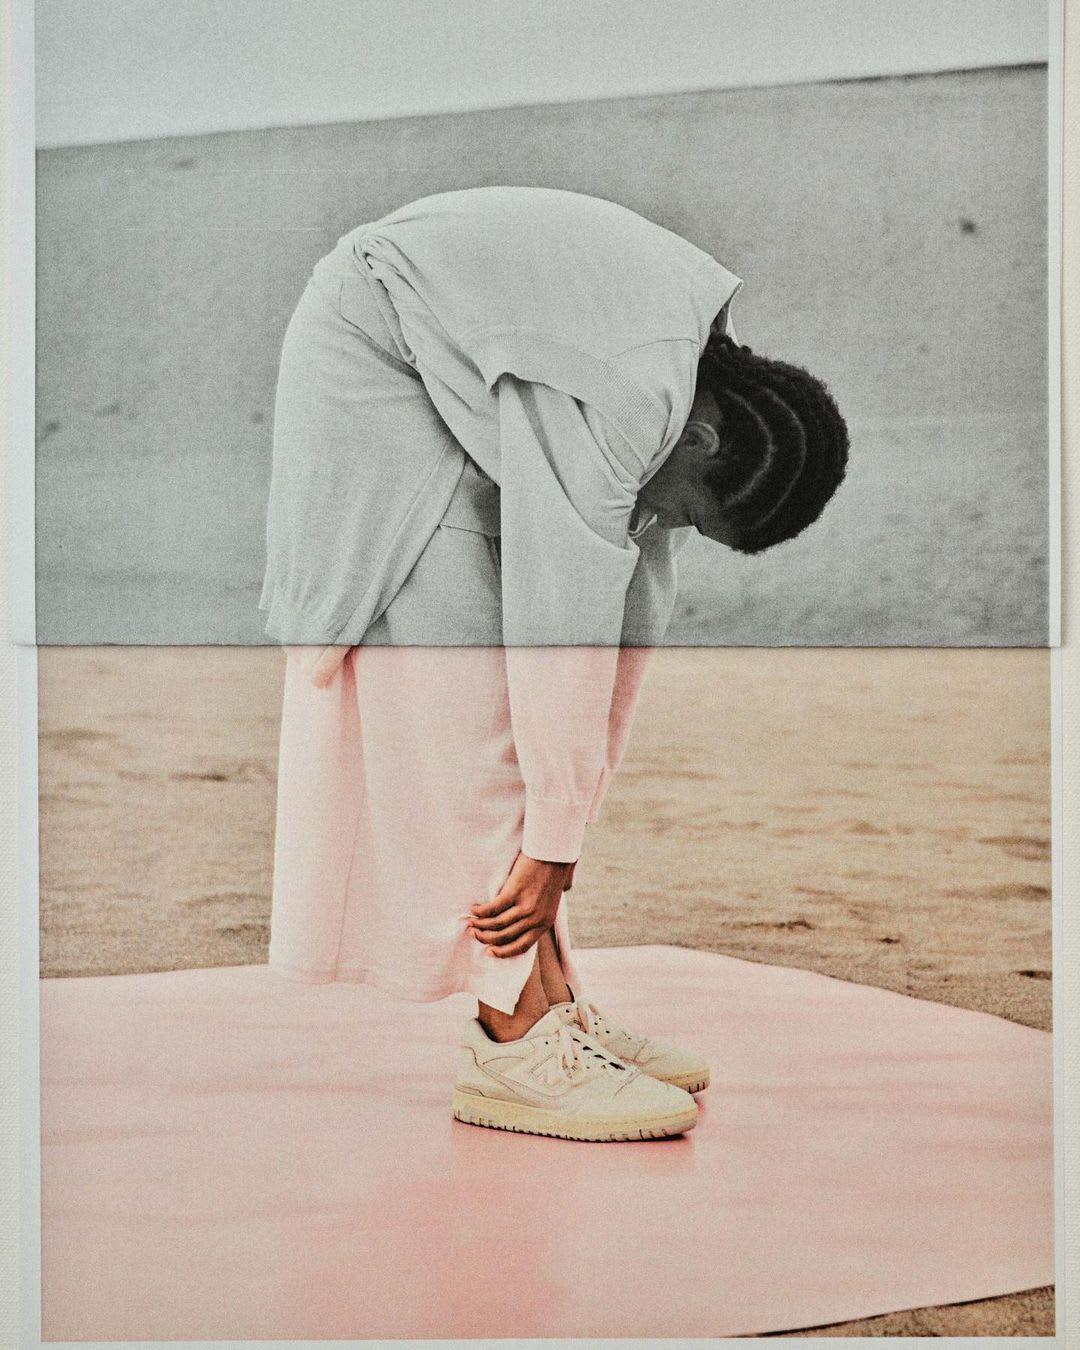 Auralee x New Balance 550 (On-Foot)